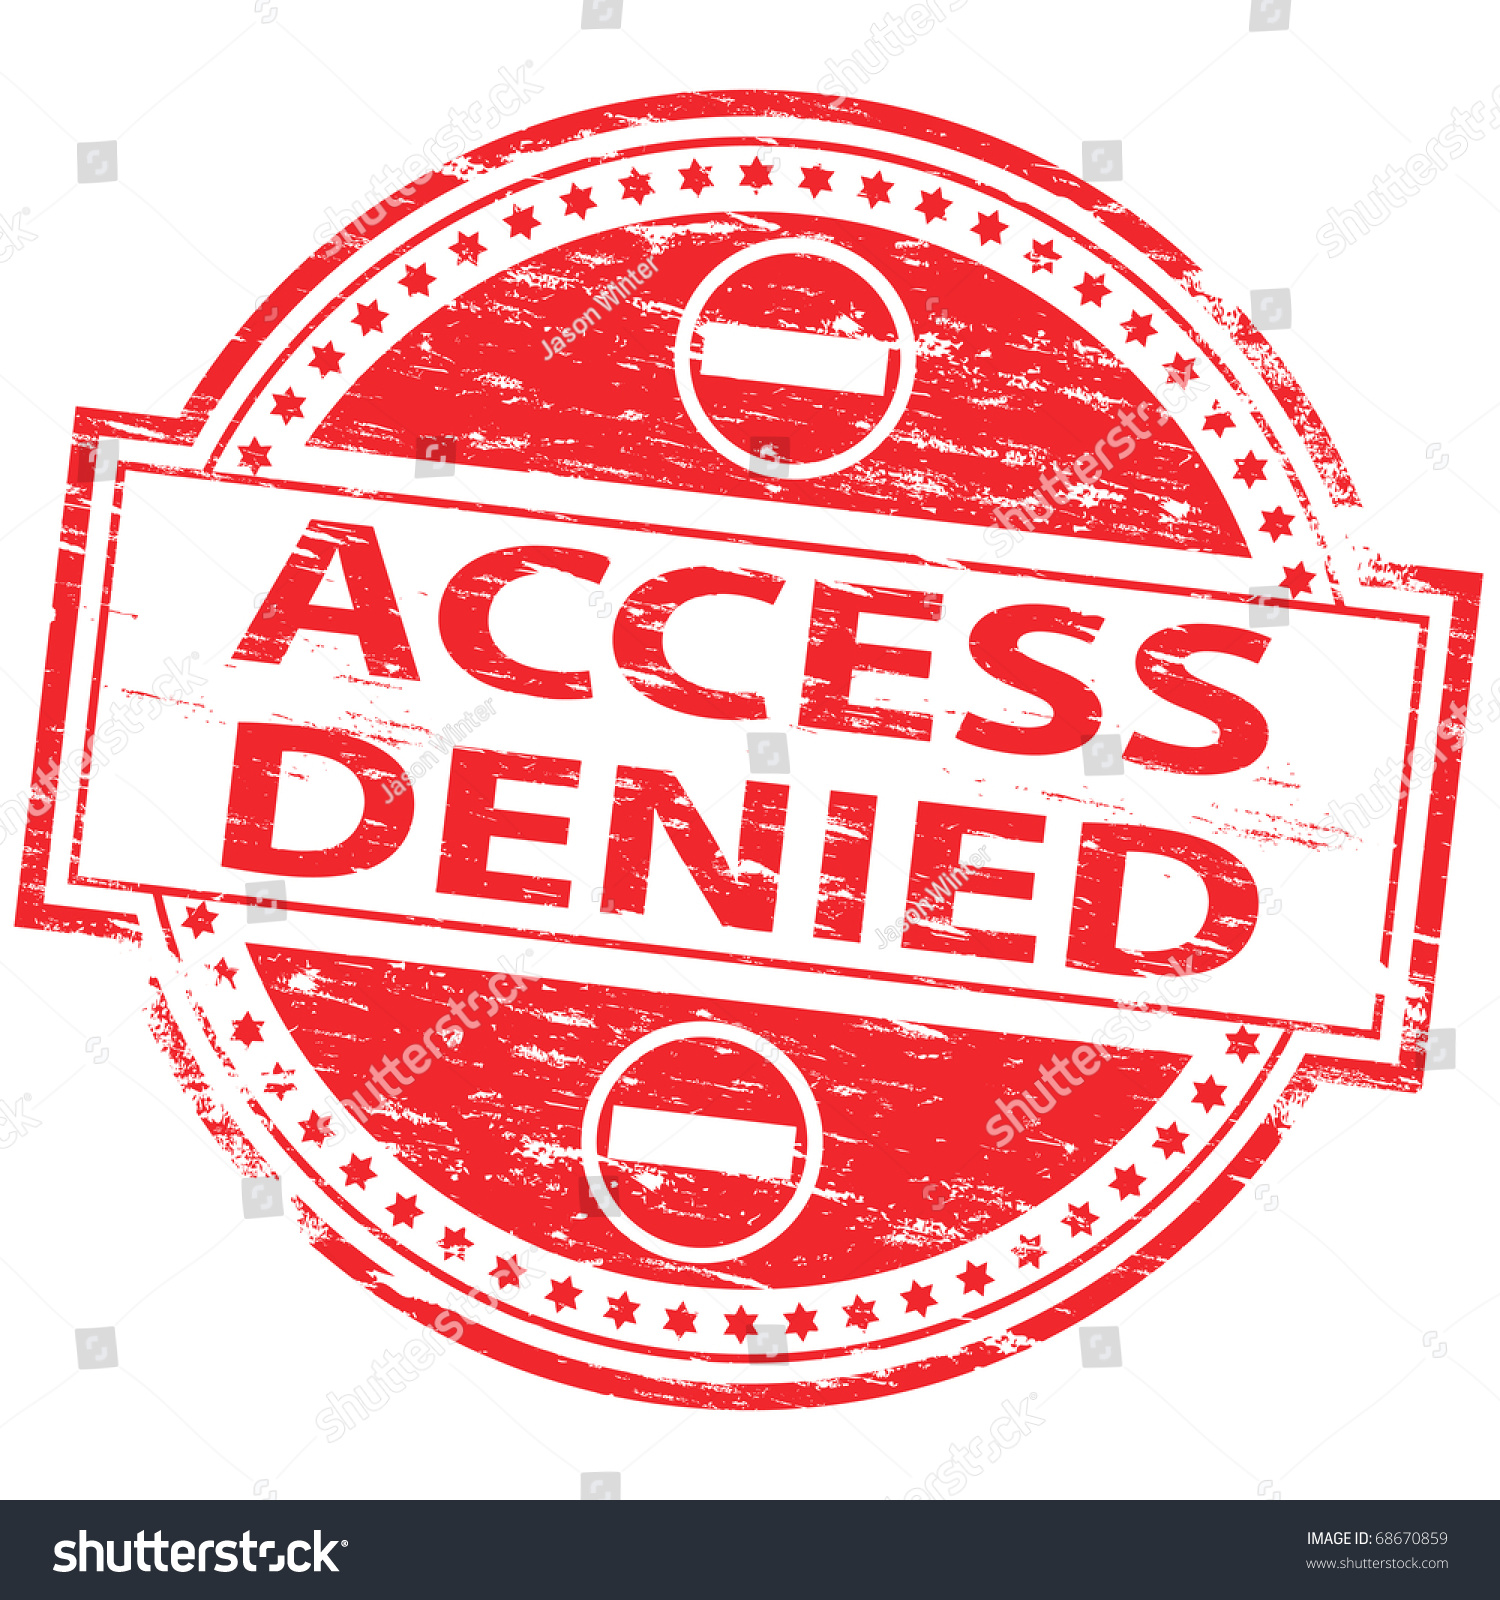 Denied >> Rubber Stamp Illustration Showing Access Denied